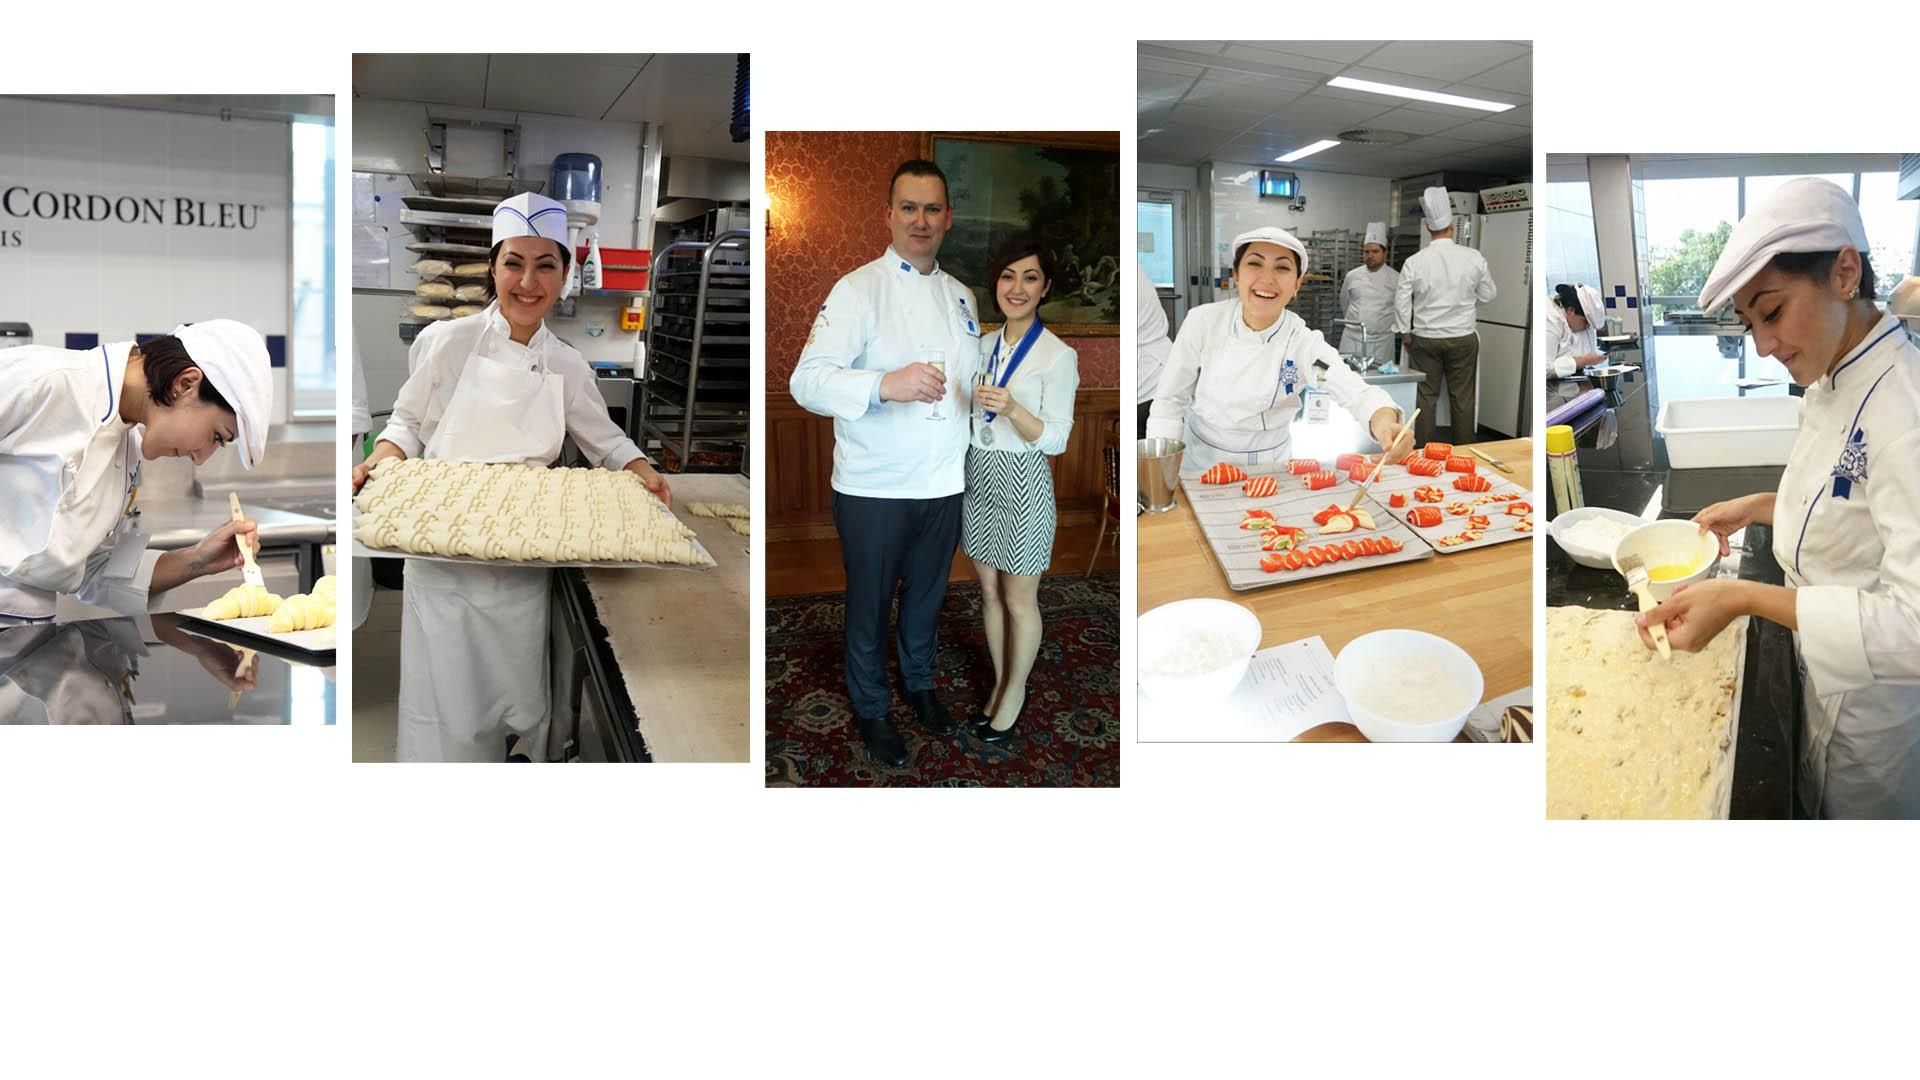 Merve Armagan Diplome de Boulangerie 2017